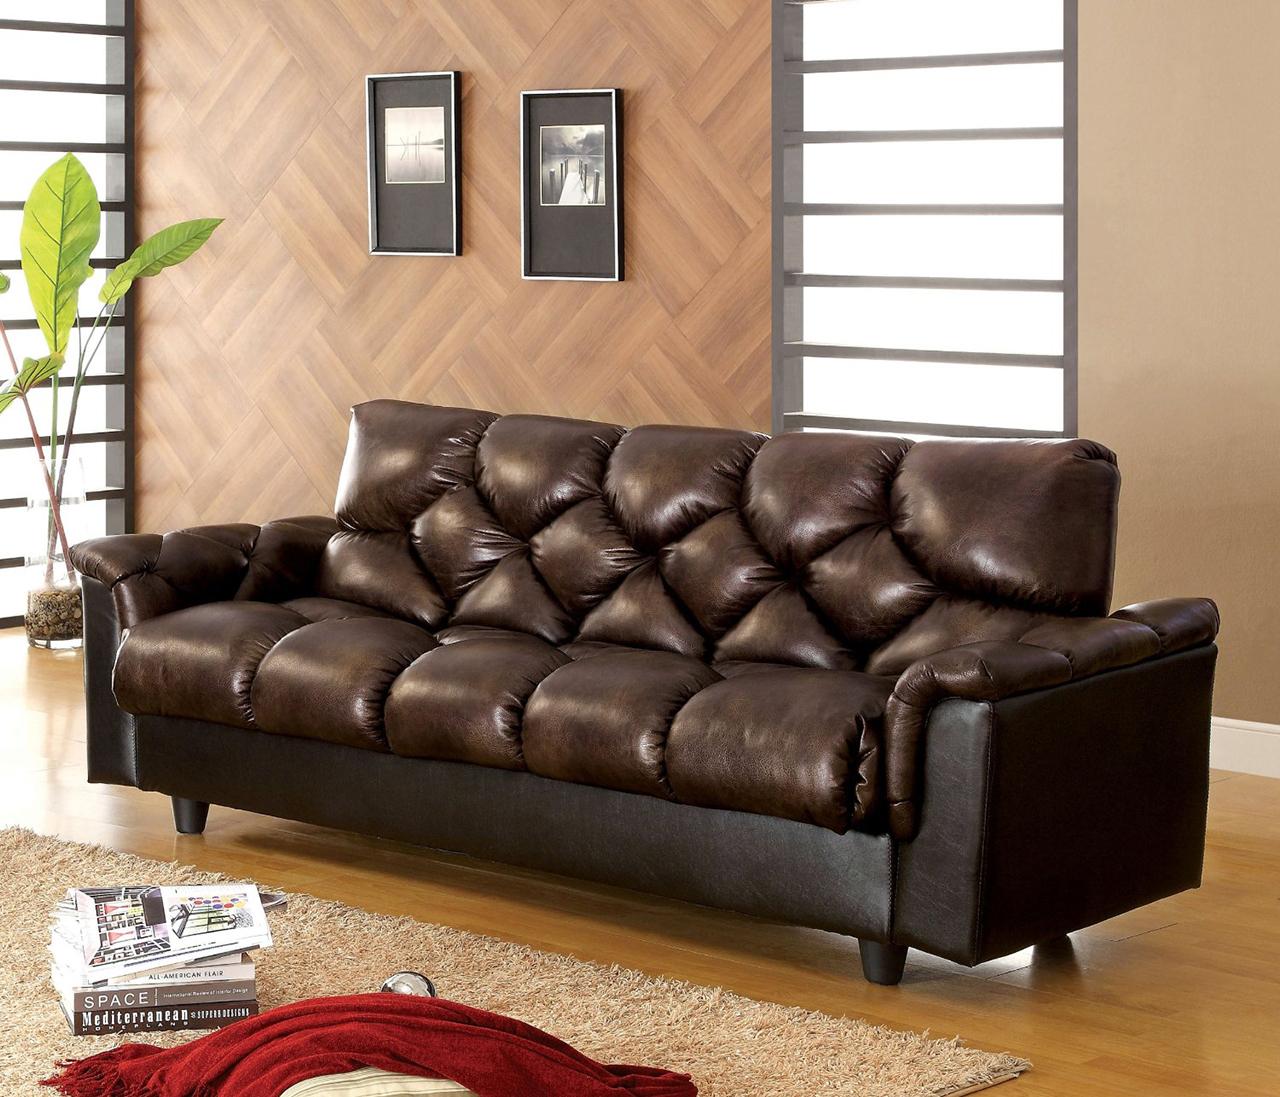 Sleeper Sofa - Carlington Leather Vinyl Storage Sleeper Sofa